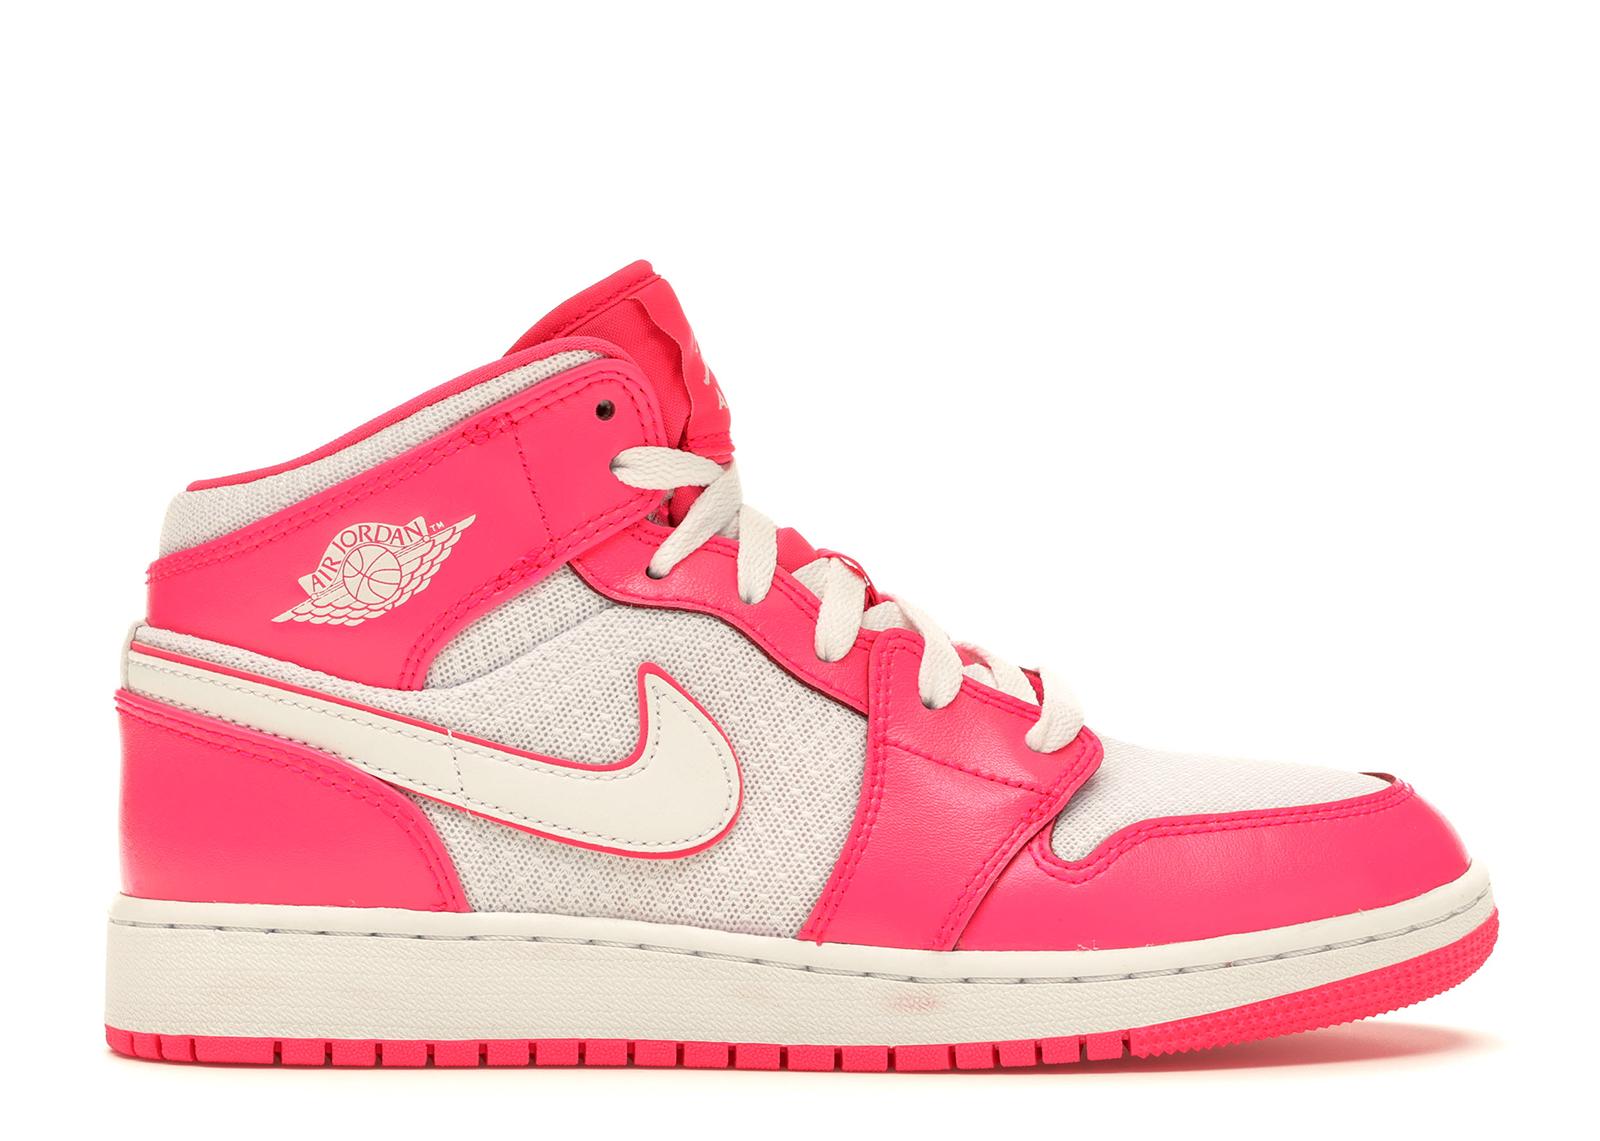 Jordan 1 Mid Hyper Pink White (GS)